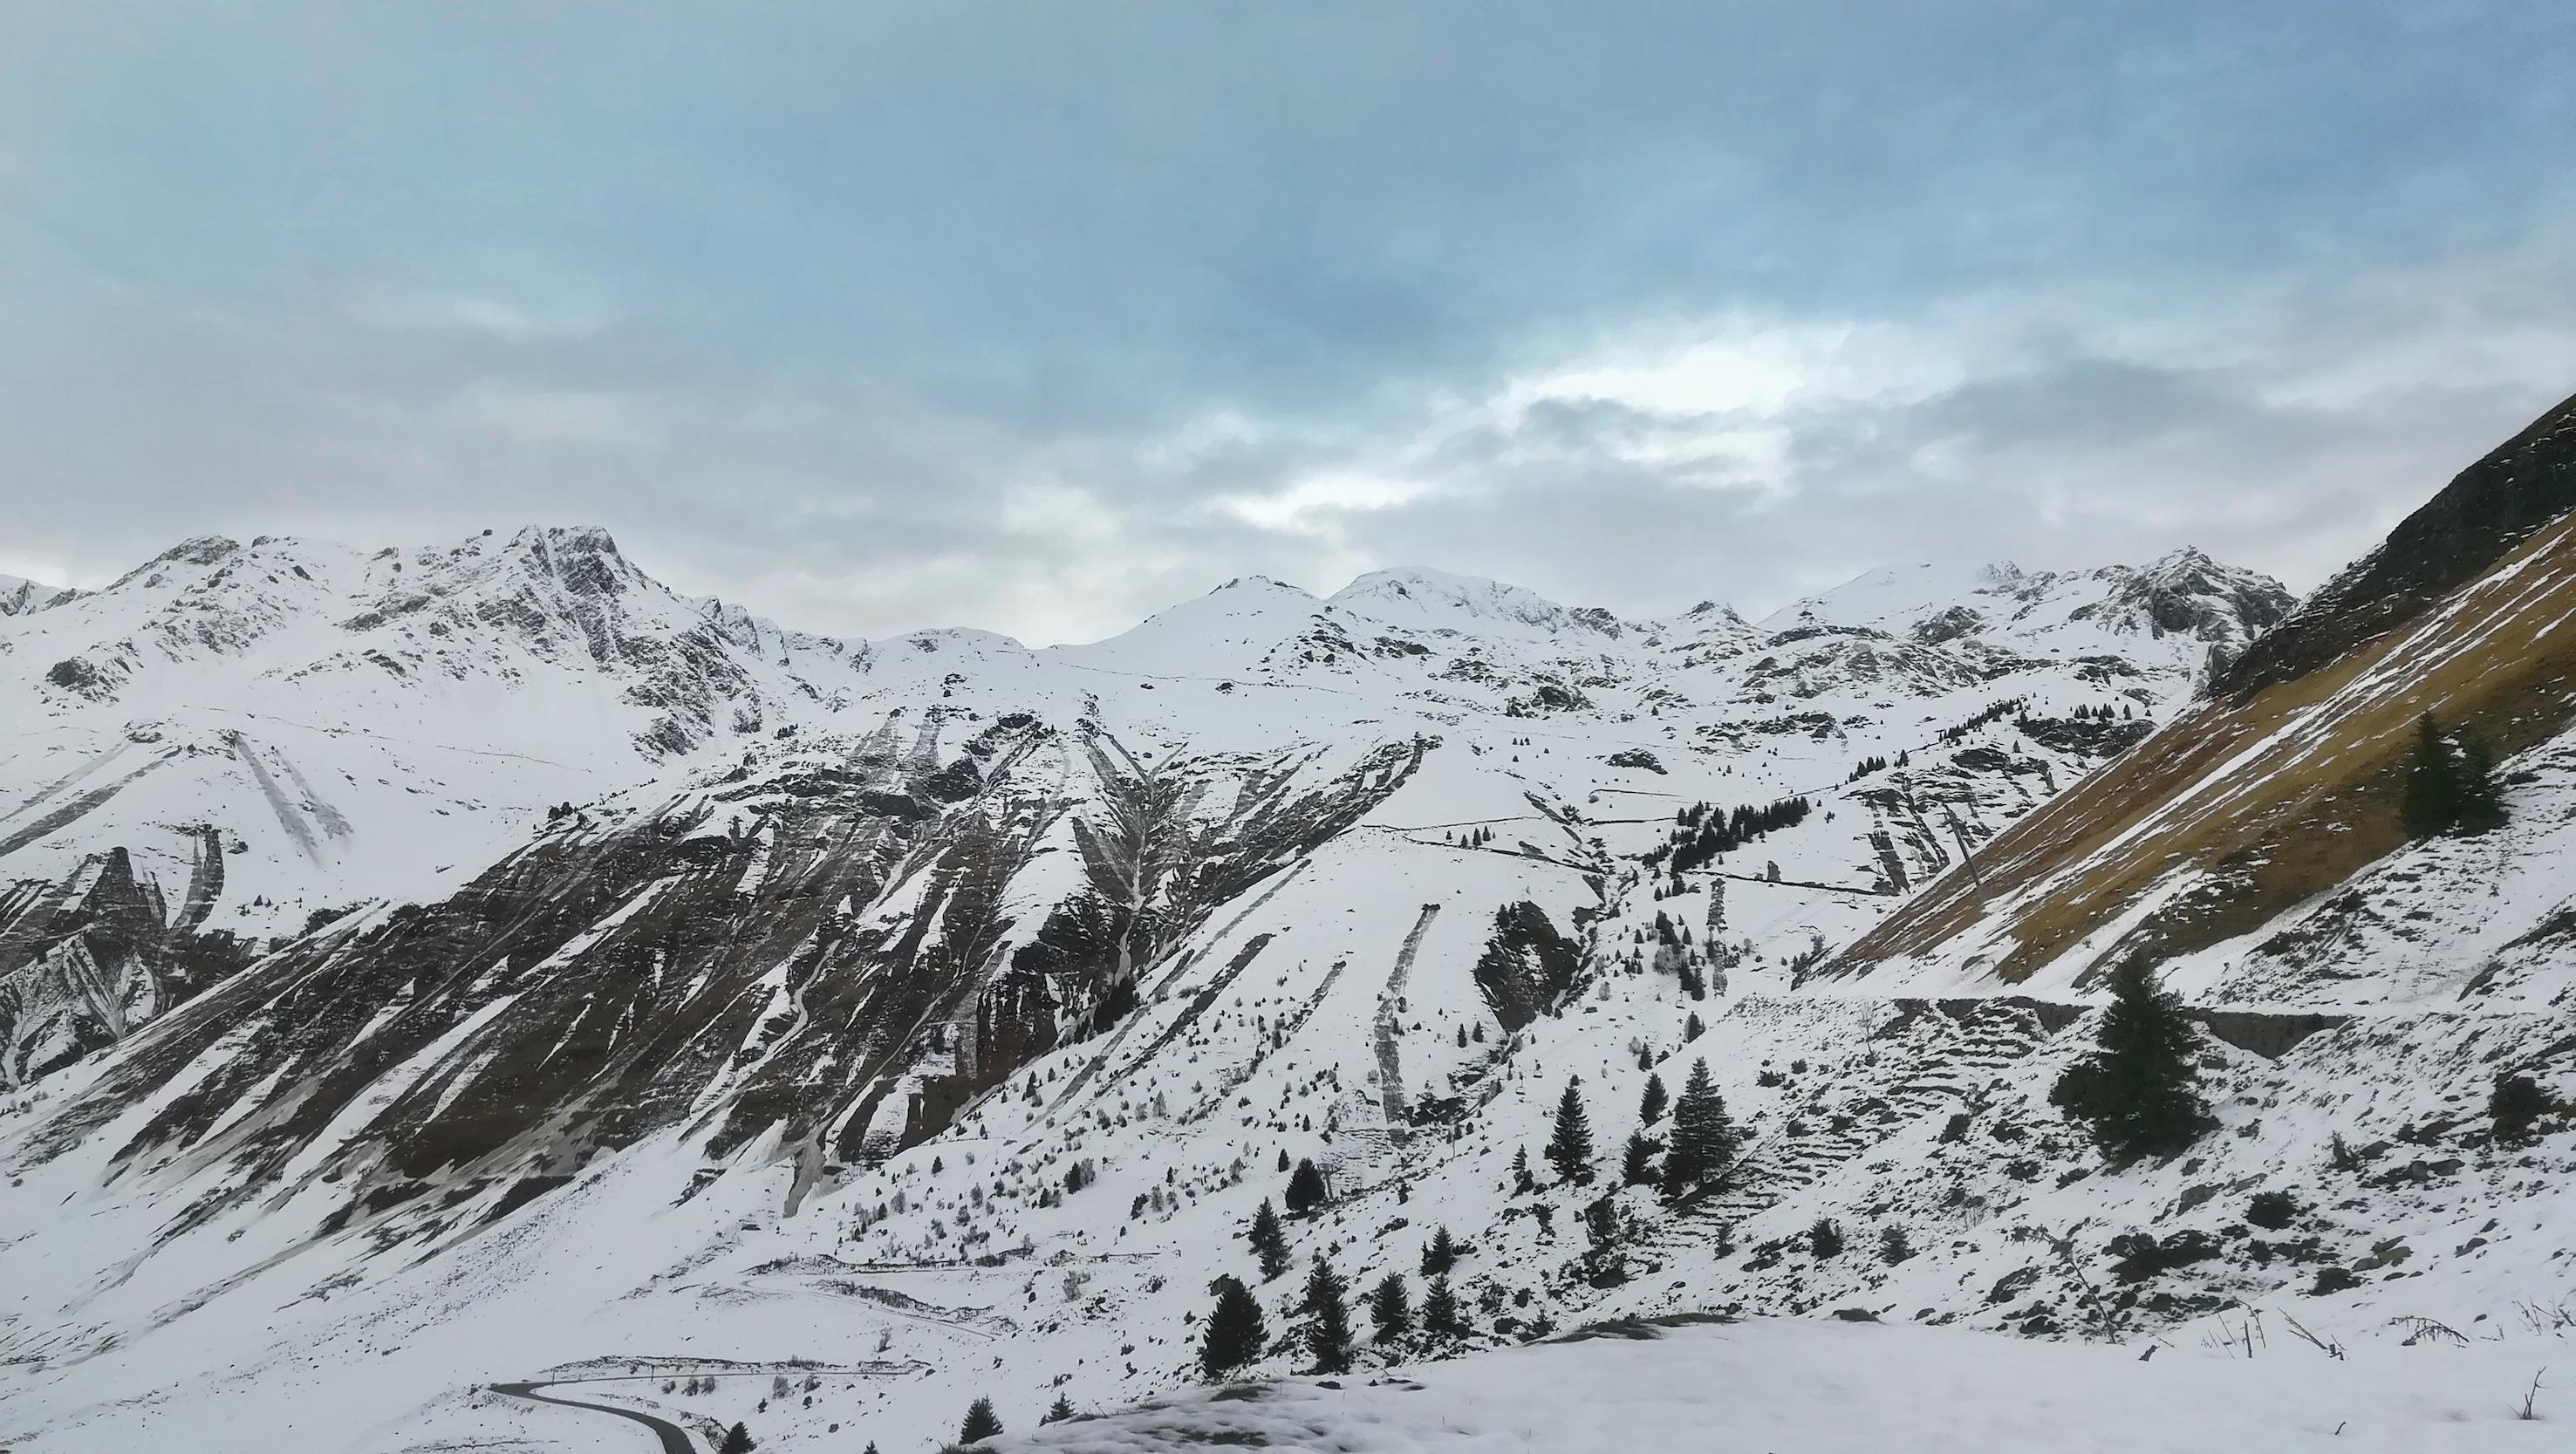 Valle de Barèges. Pirineo francés nevado